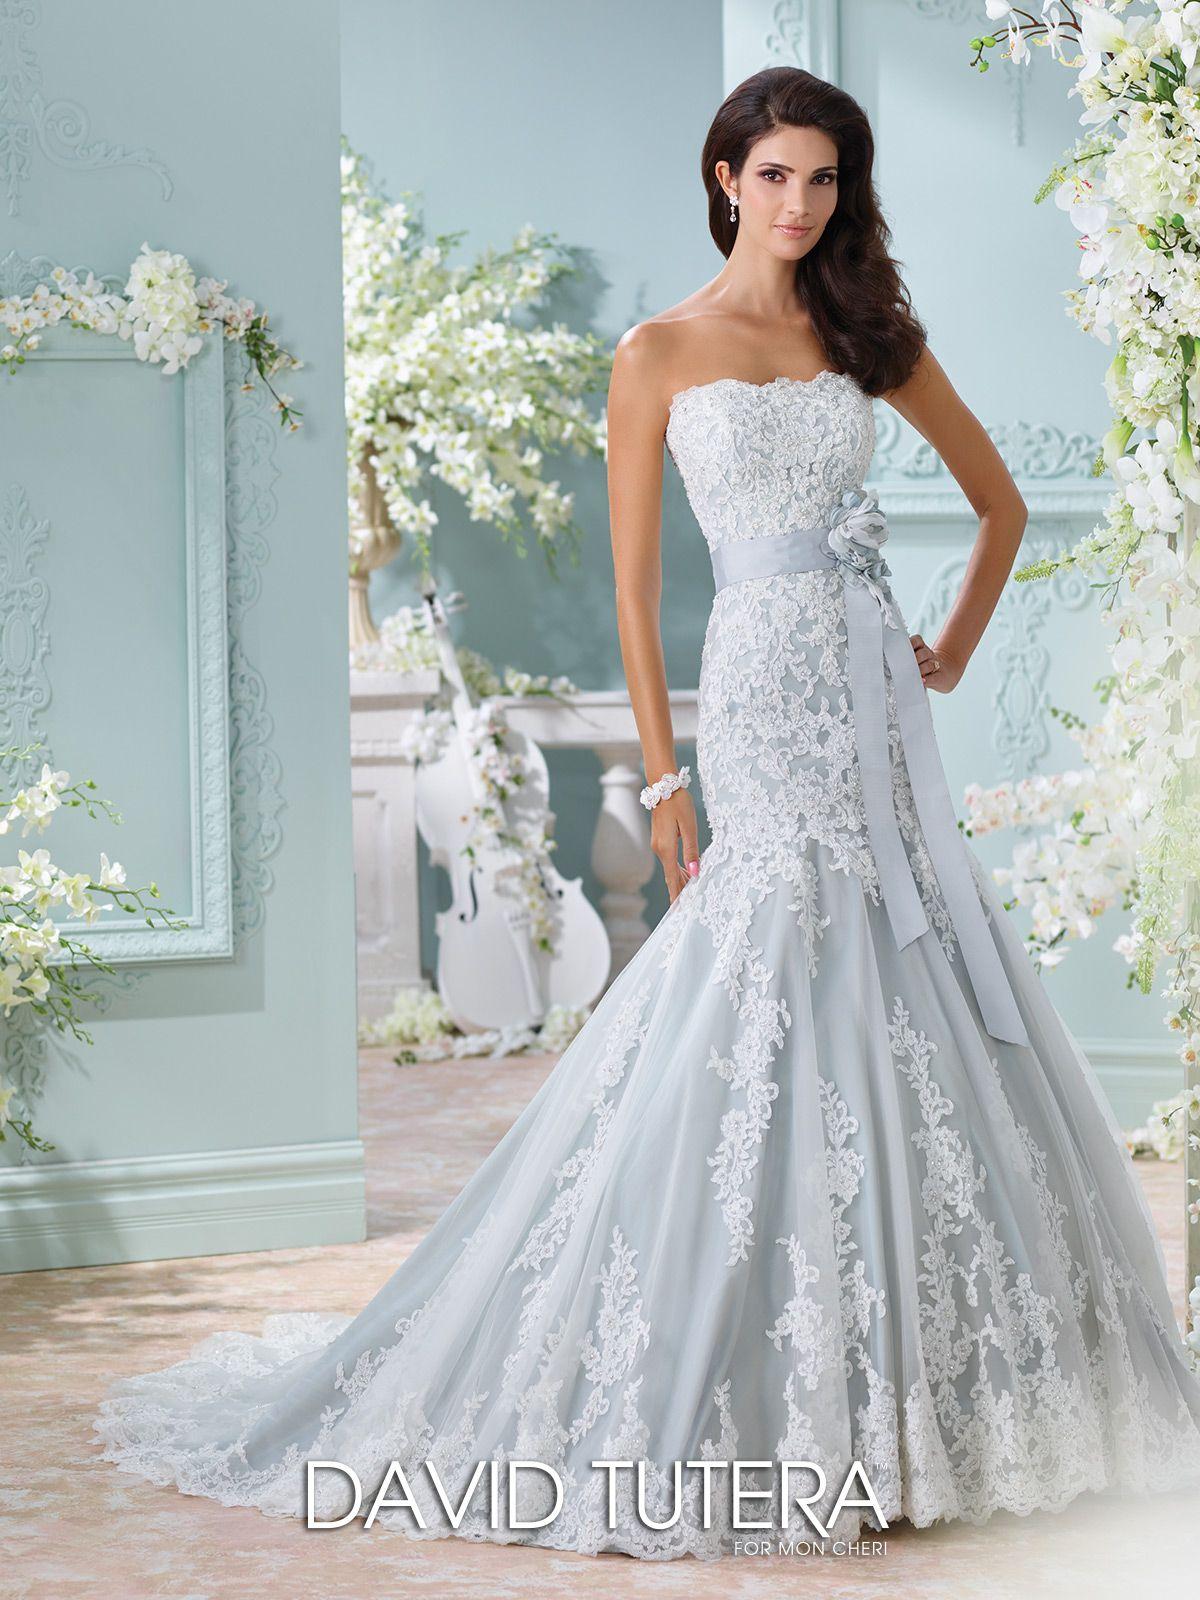 Unique Wedding Dresses Fall 2018 - Martin Thornburg | Blue wedding ...